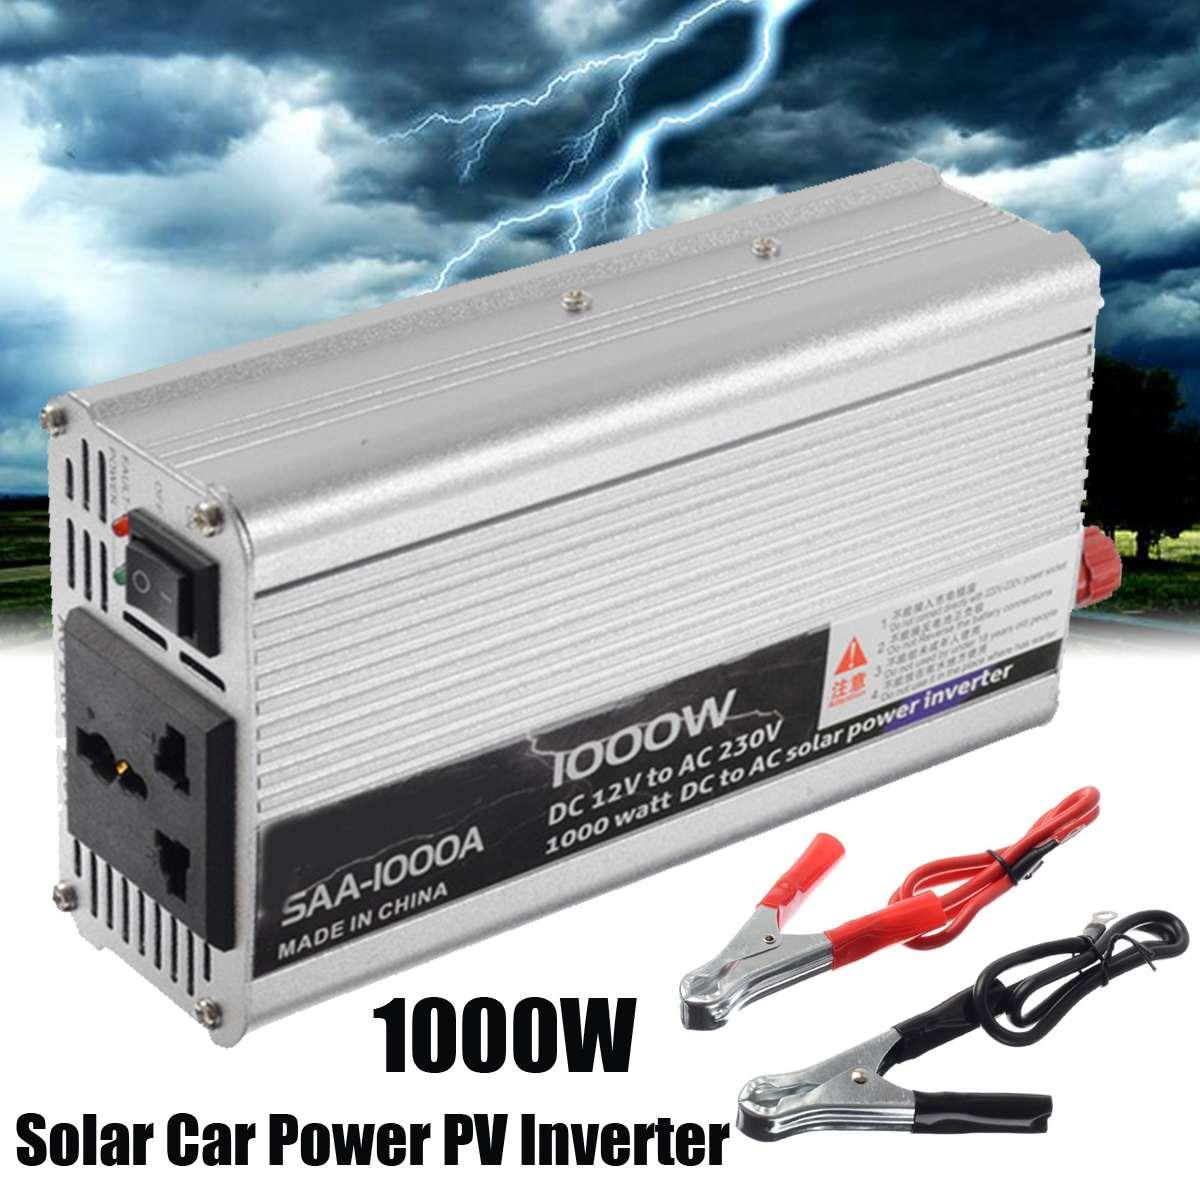 1000W DC 12V to AC 220V Converter Transformer Home Car Solar Power PV Inverter Converter Pure Sine Wave Supply Switch Wind Power